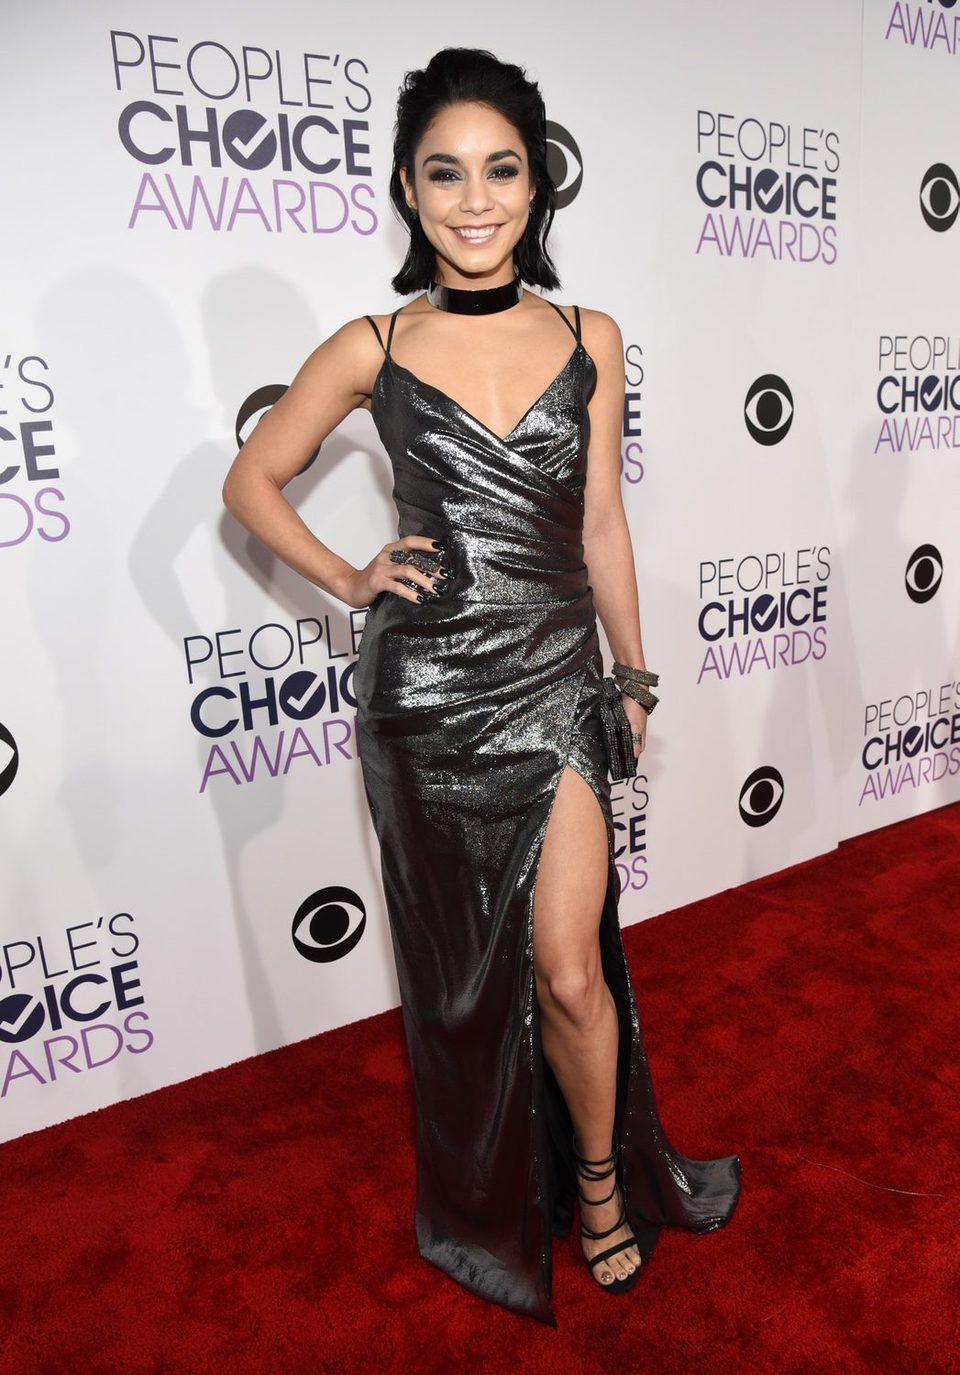 Vanessa Hudgens en los People's Choice Awards 2016